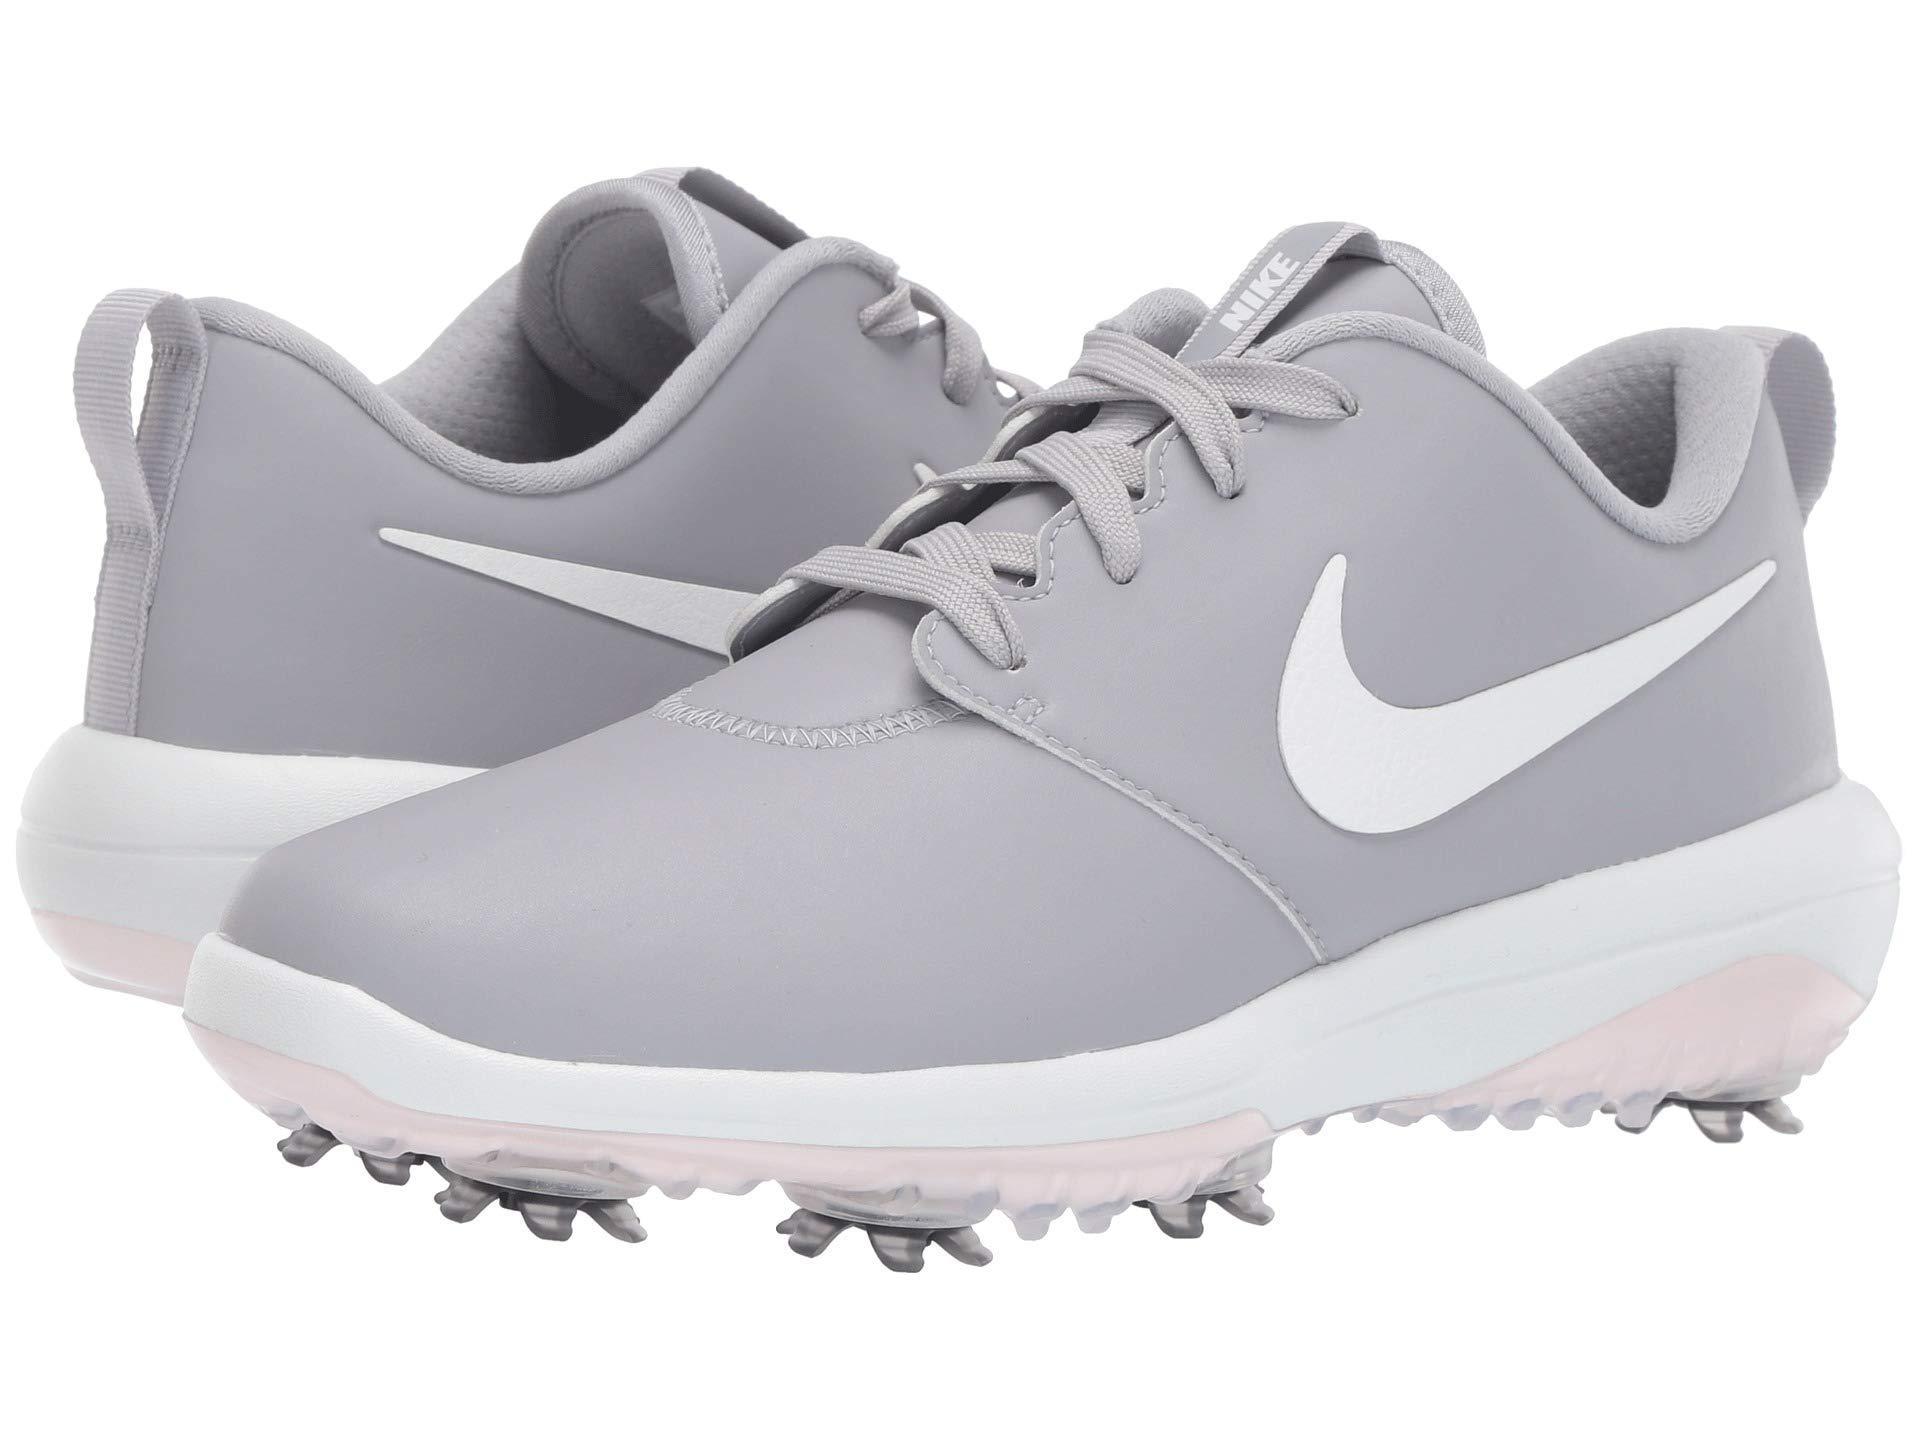 99674a9f6fe7 Nike Roshe G Tour (wolf Grey metallic White white) Women s Golf ...